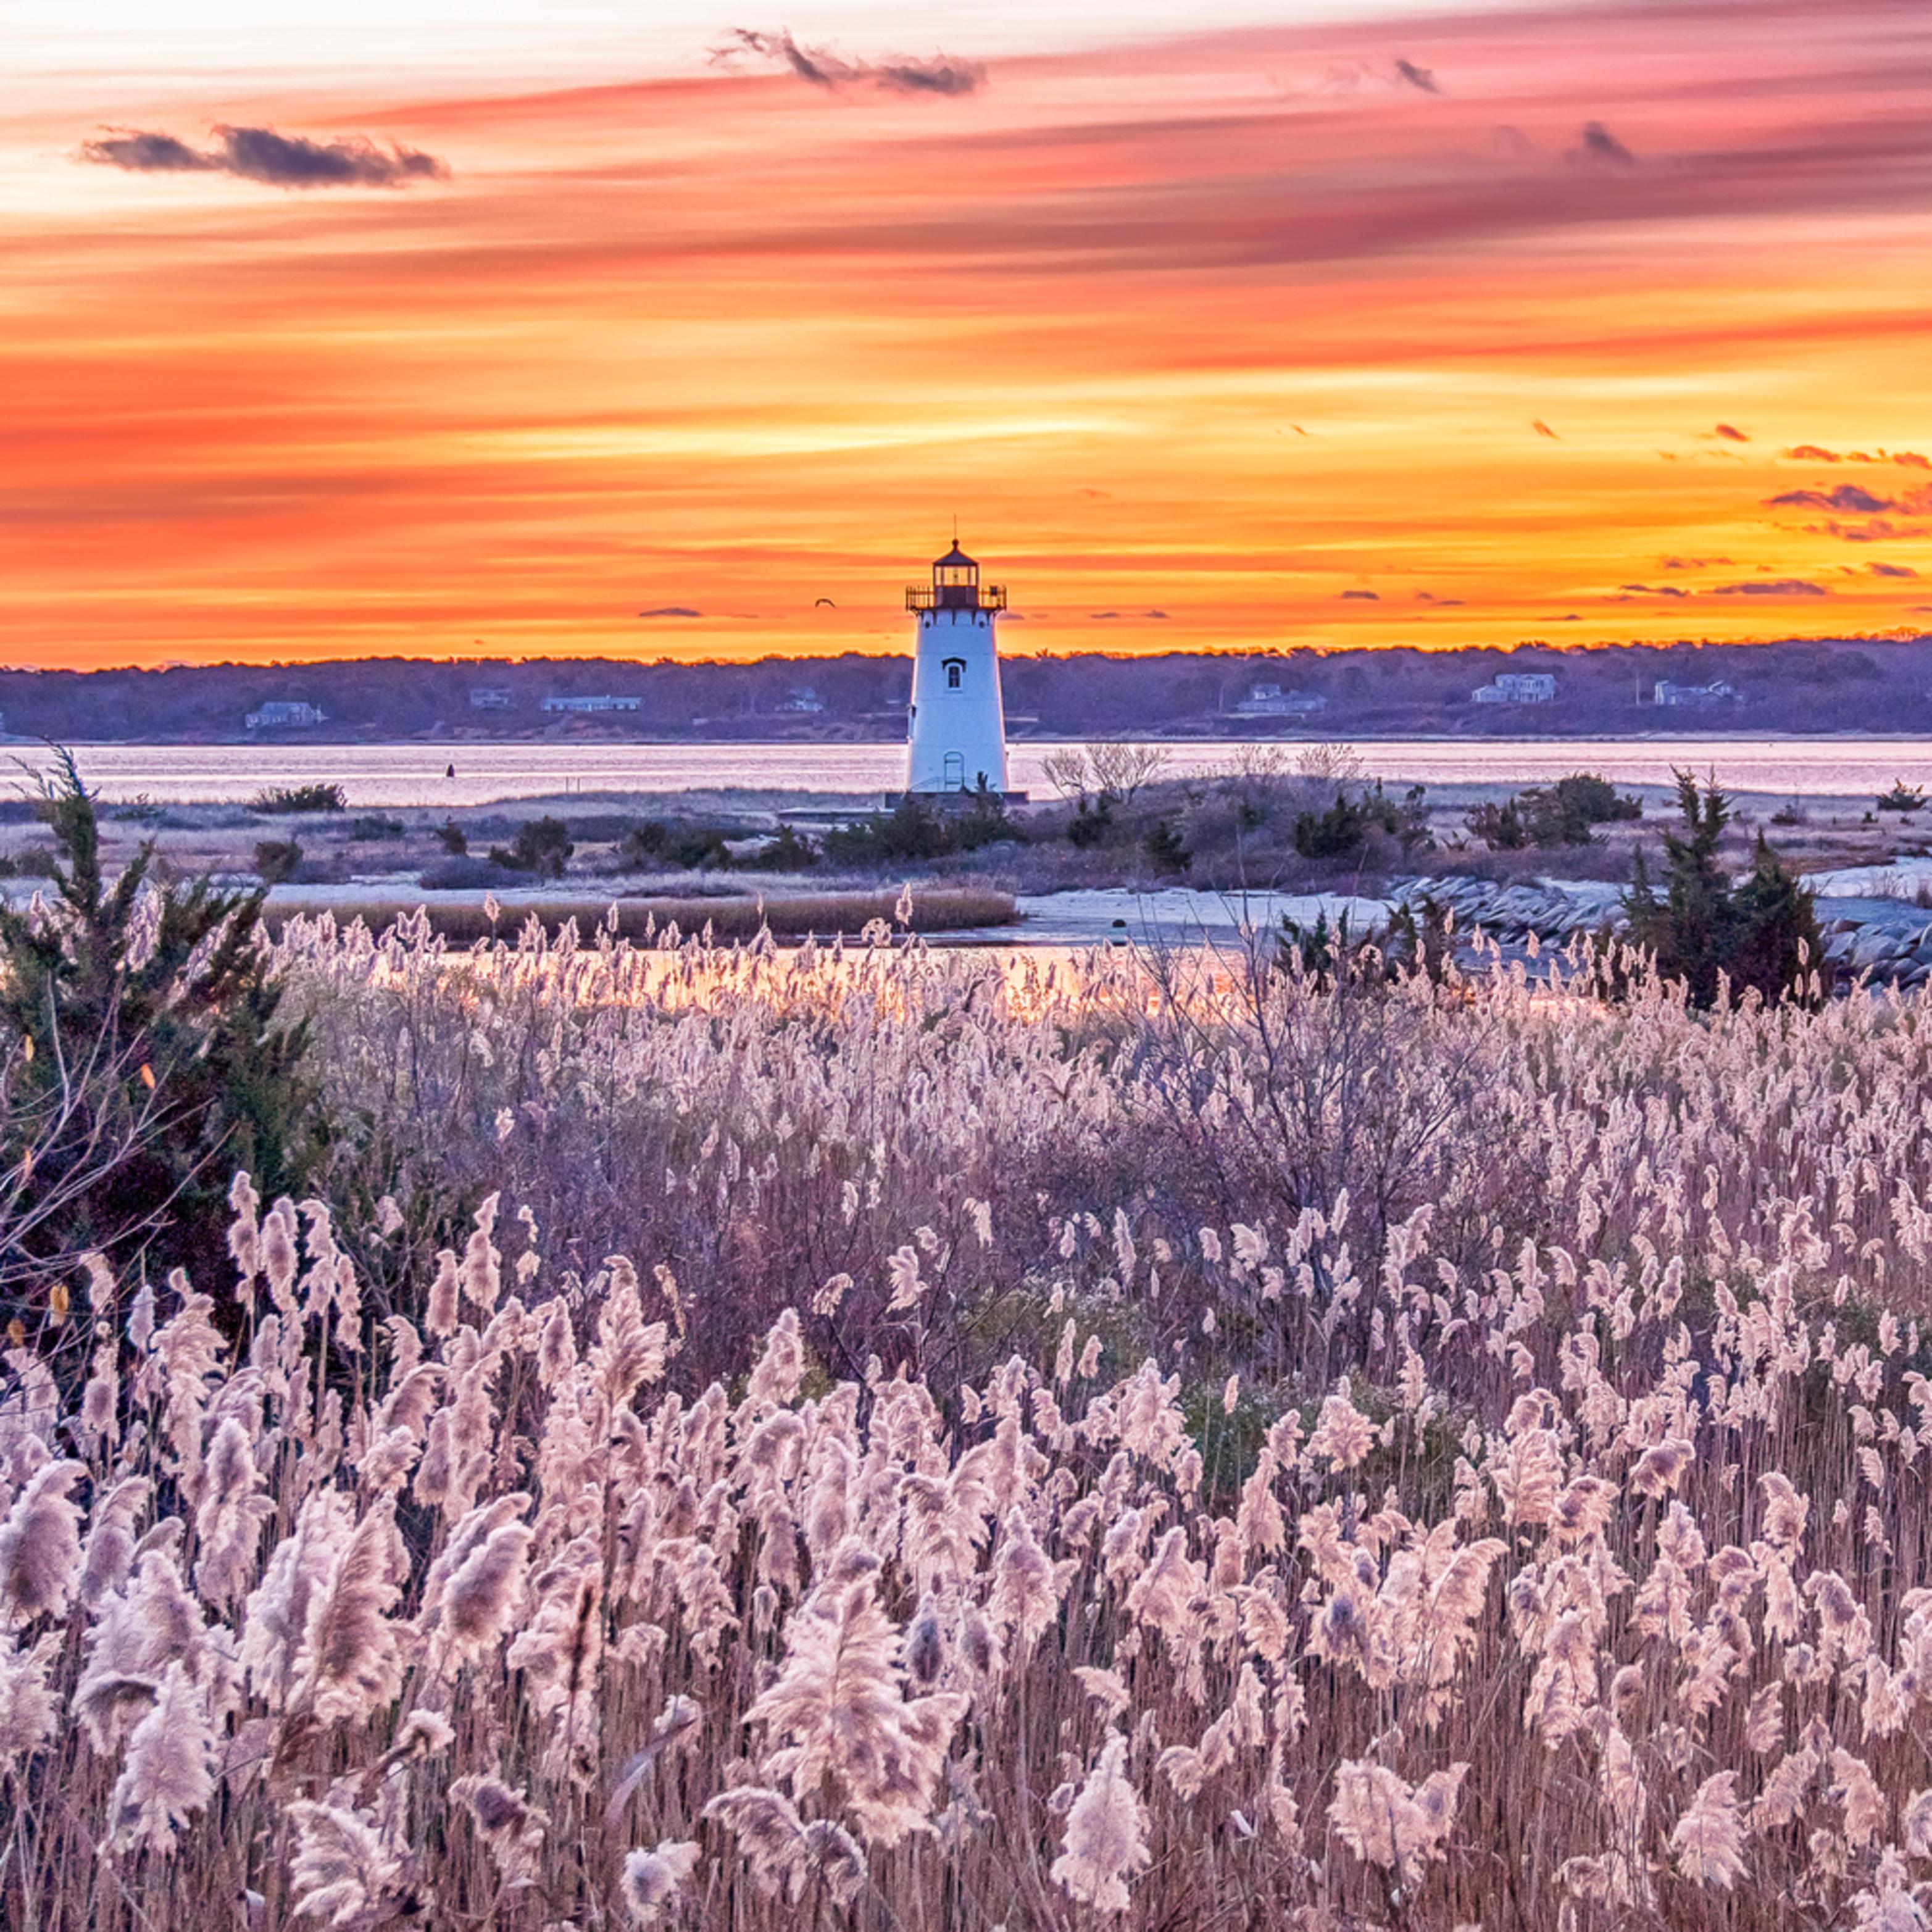 Edgartown light reeds ynau1p